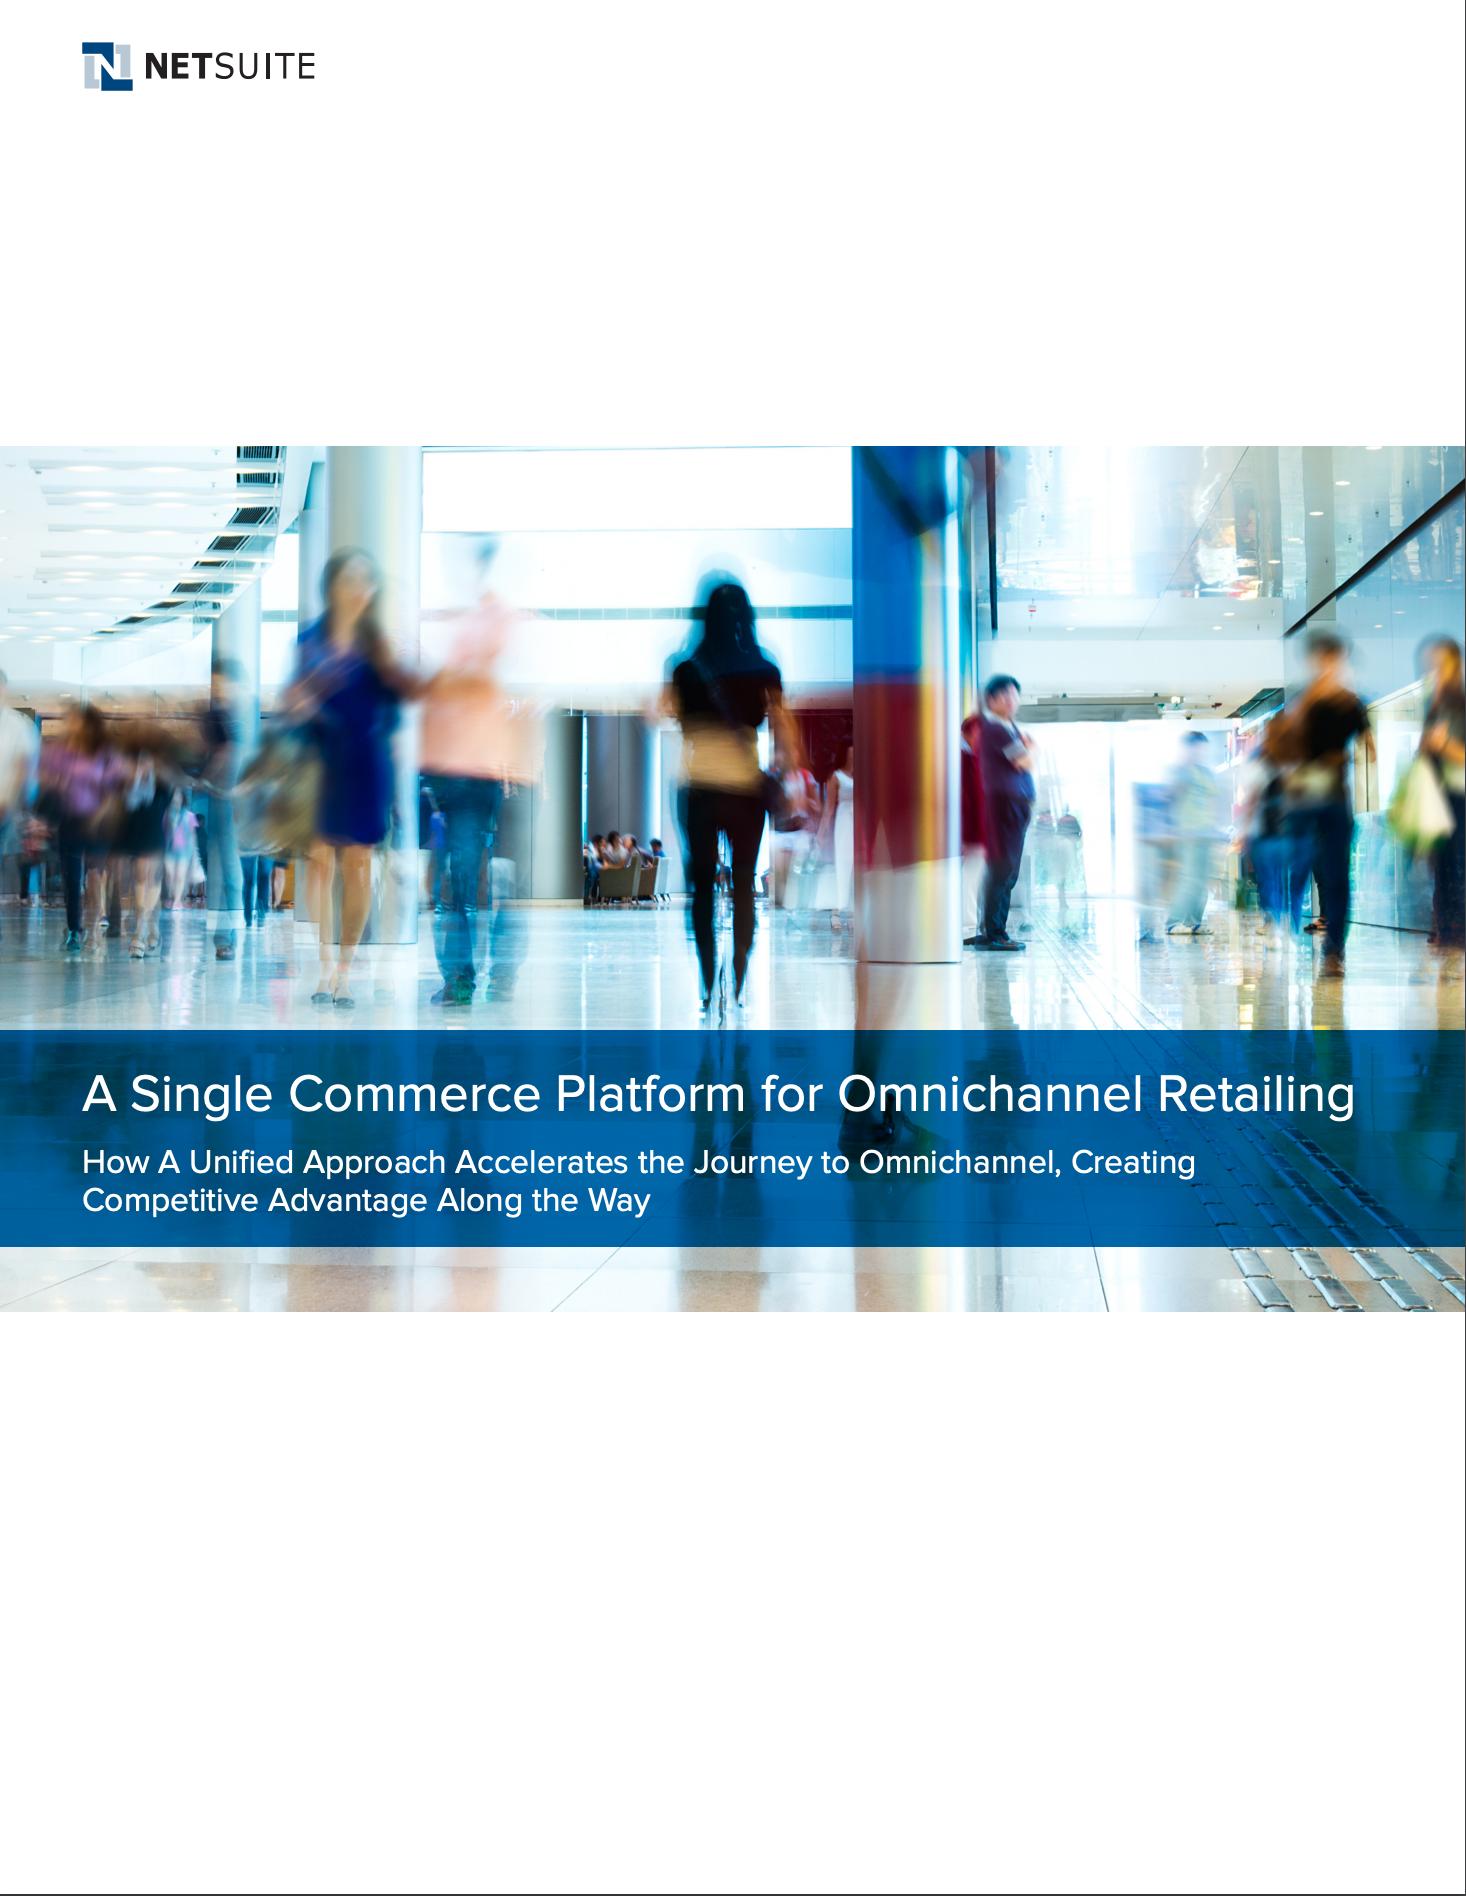 A Single Commerce Platform for Omnichannel Retailing